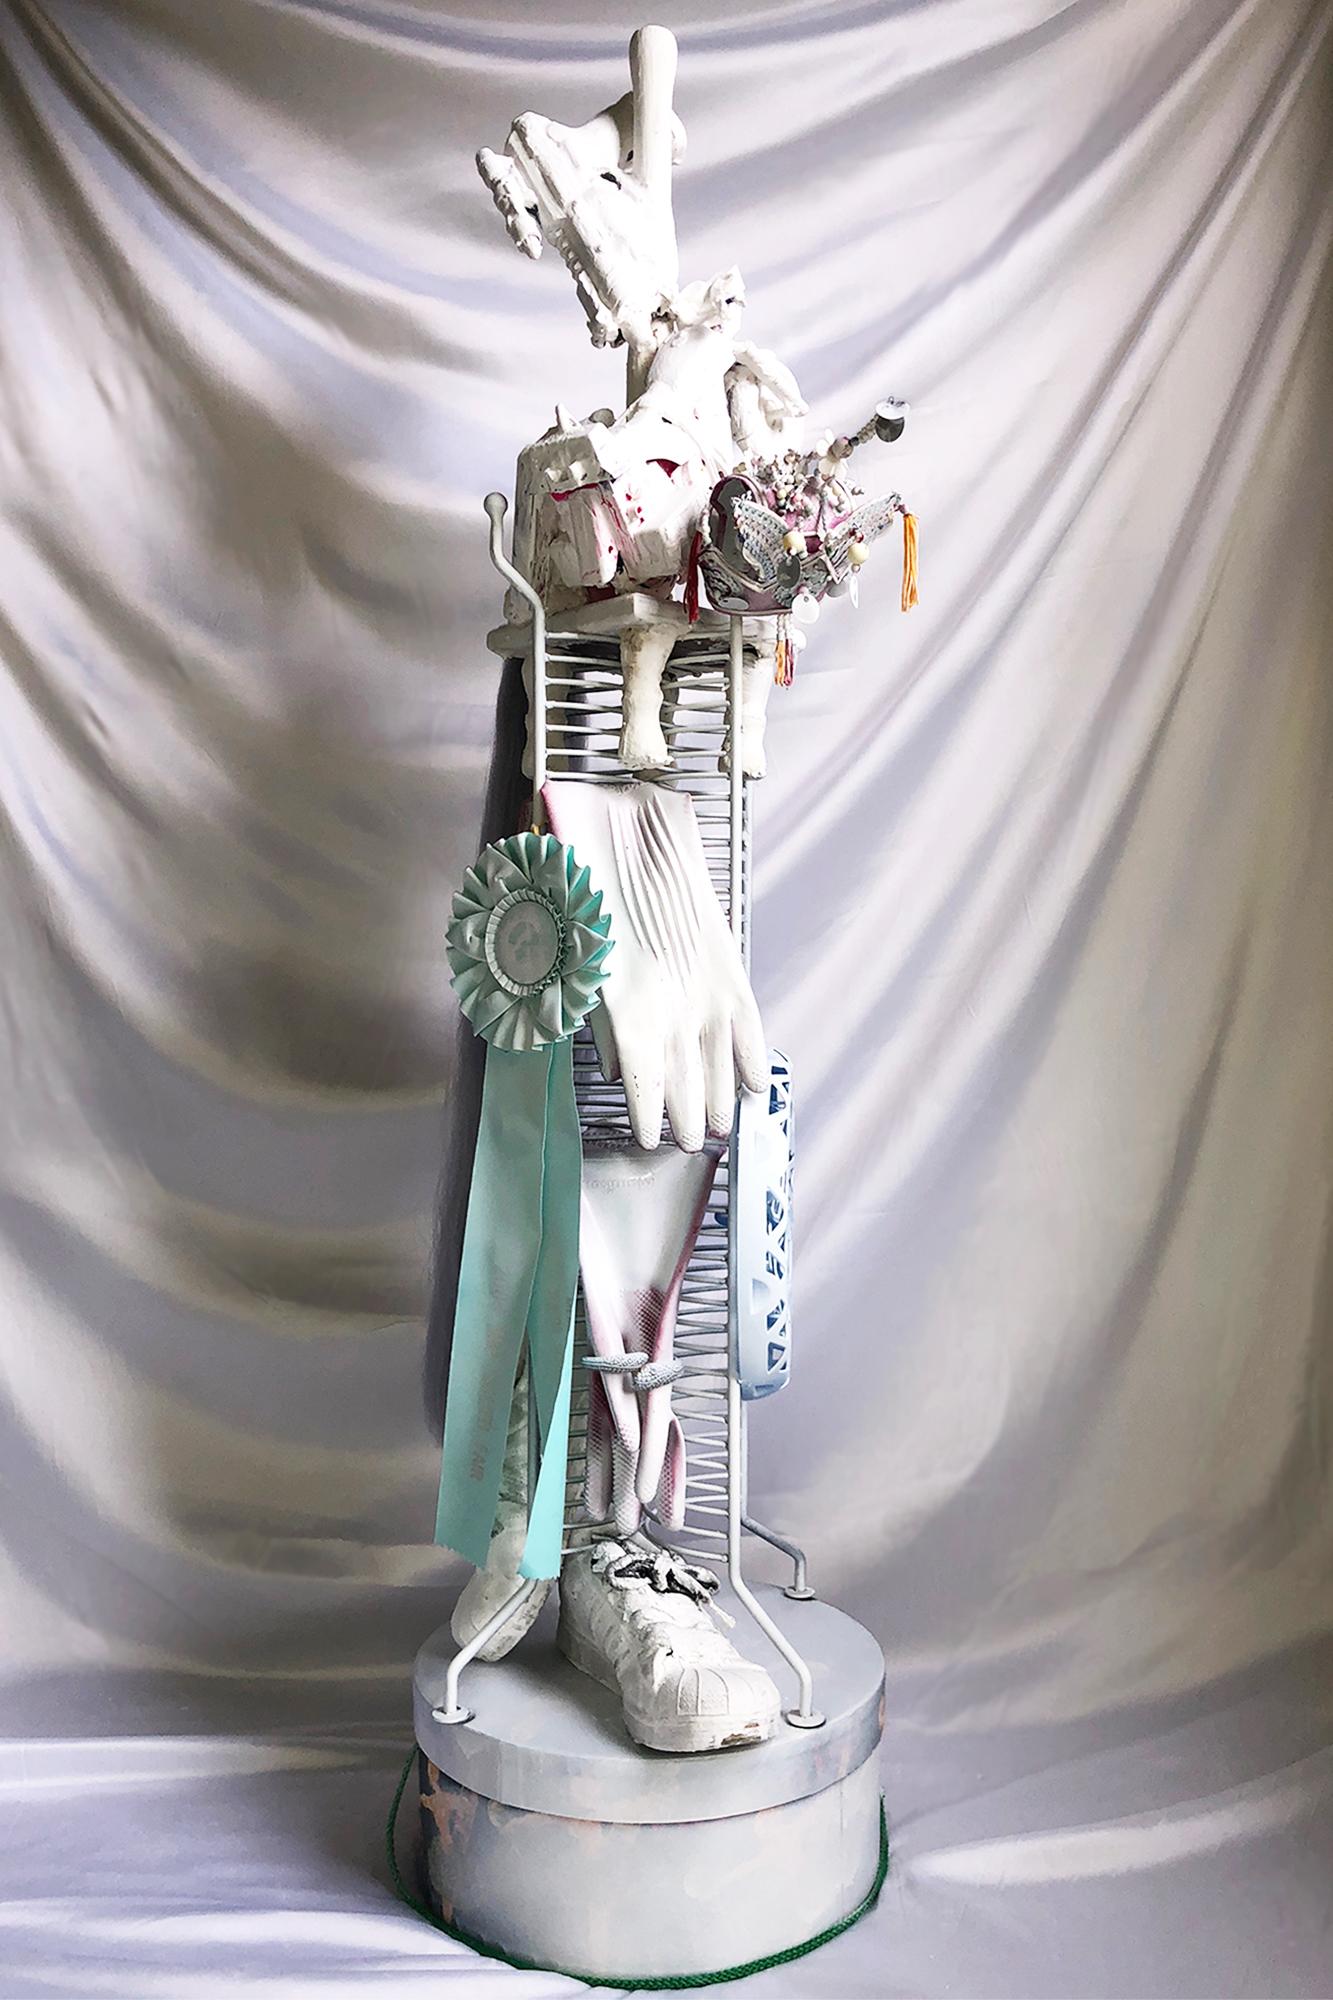 Trophy I